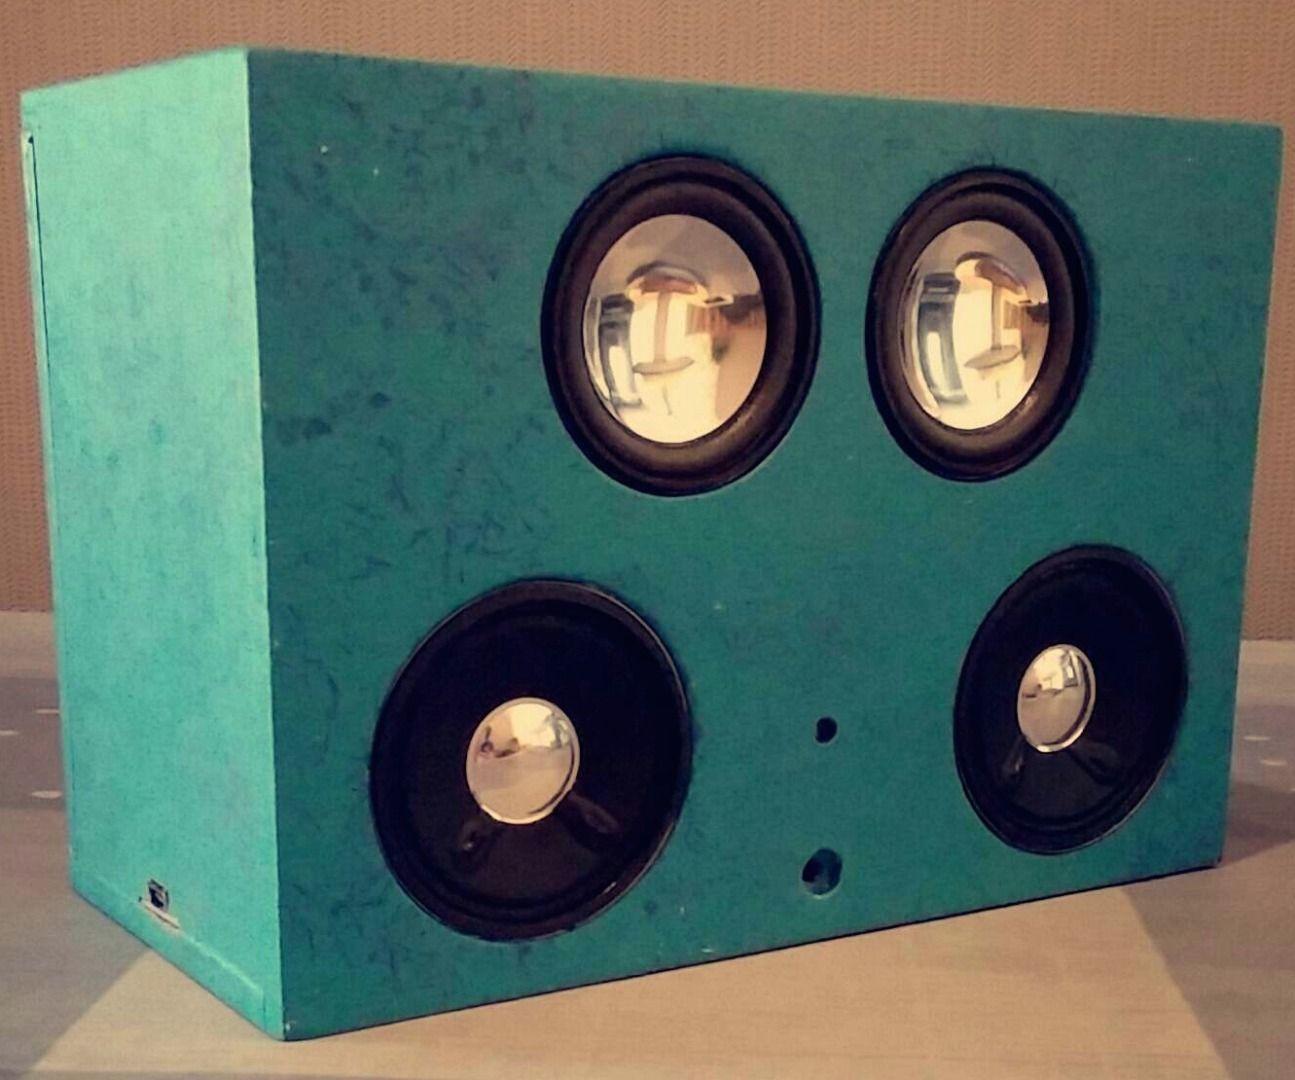 Personal bluetooth speaker